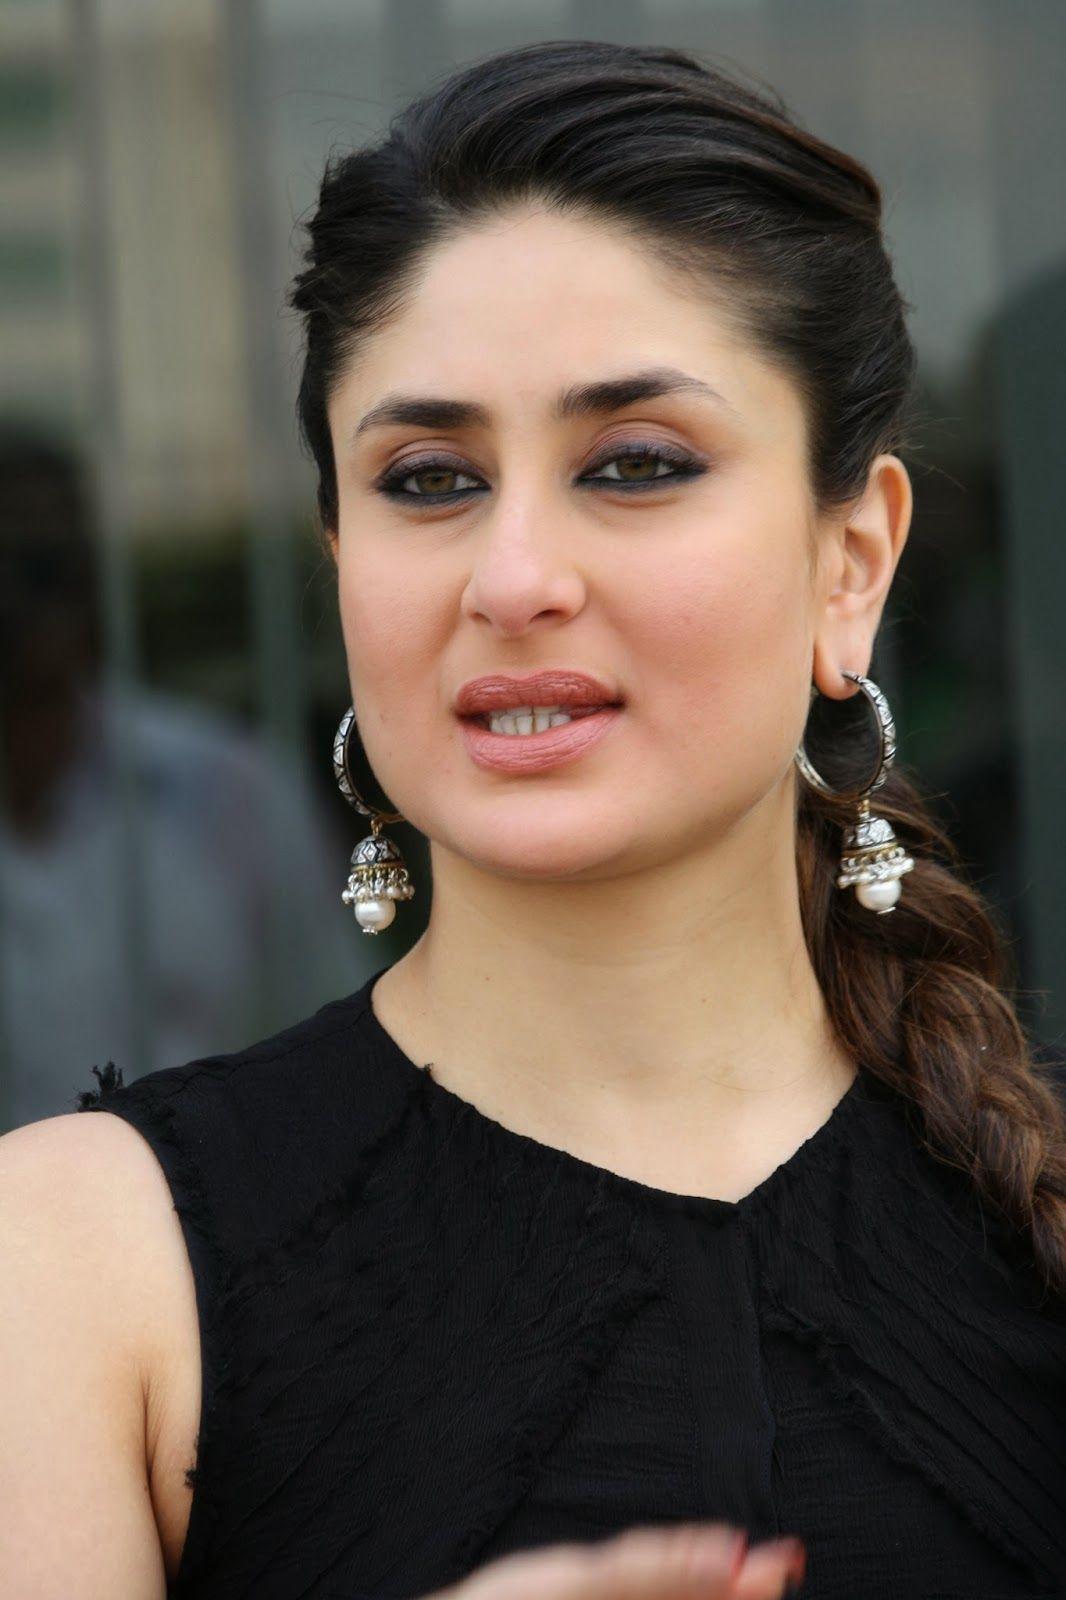 Glamorous Kareena Kapoor Photos In Black Dress Kareena Kapoor Kareena Kapoor Photos Kareena Kapoor Pics